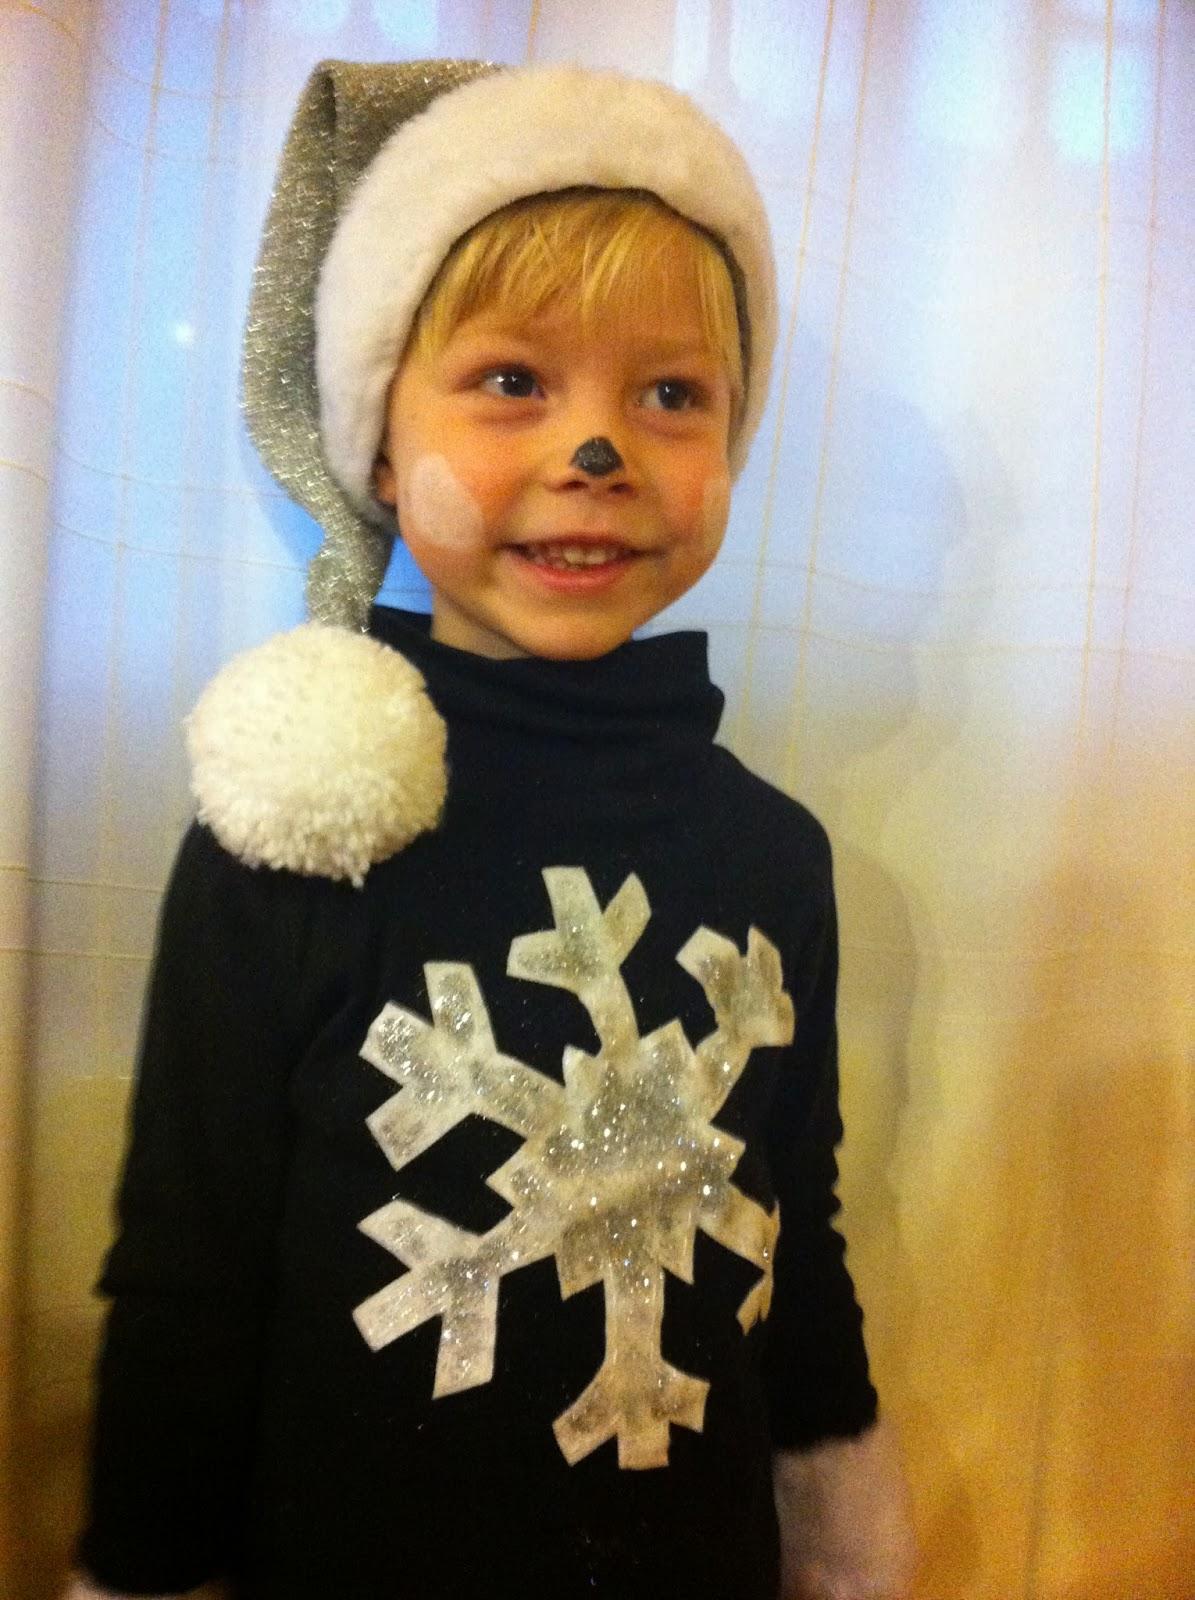 Algod n de luna disfraces de ni os para navidad - Disfraces para ninos de navidad ...